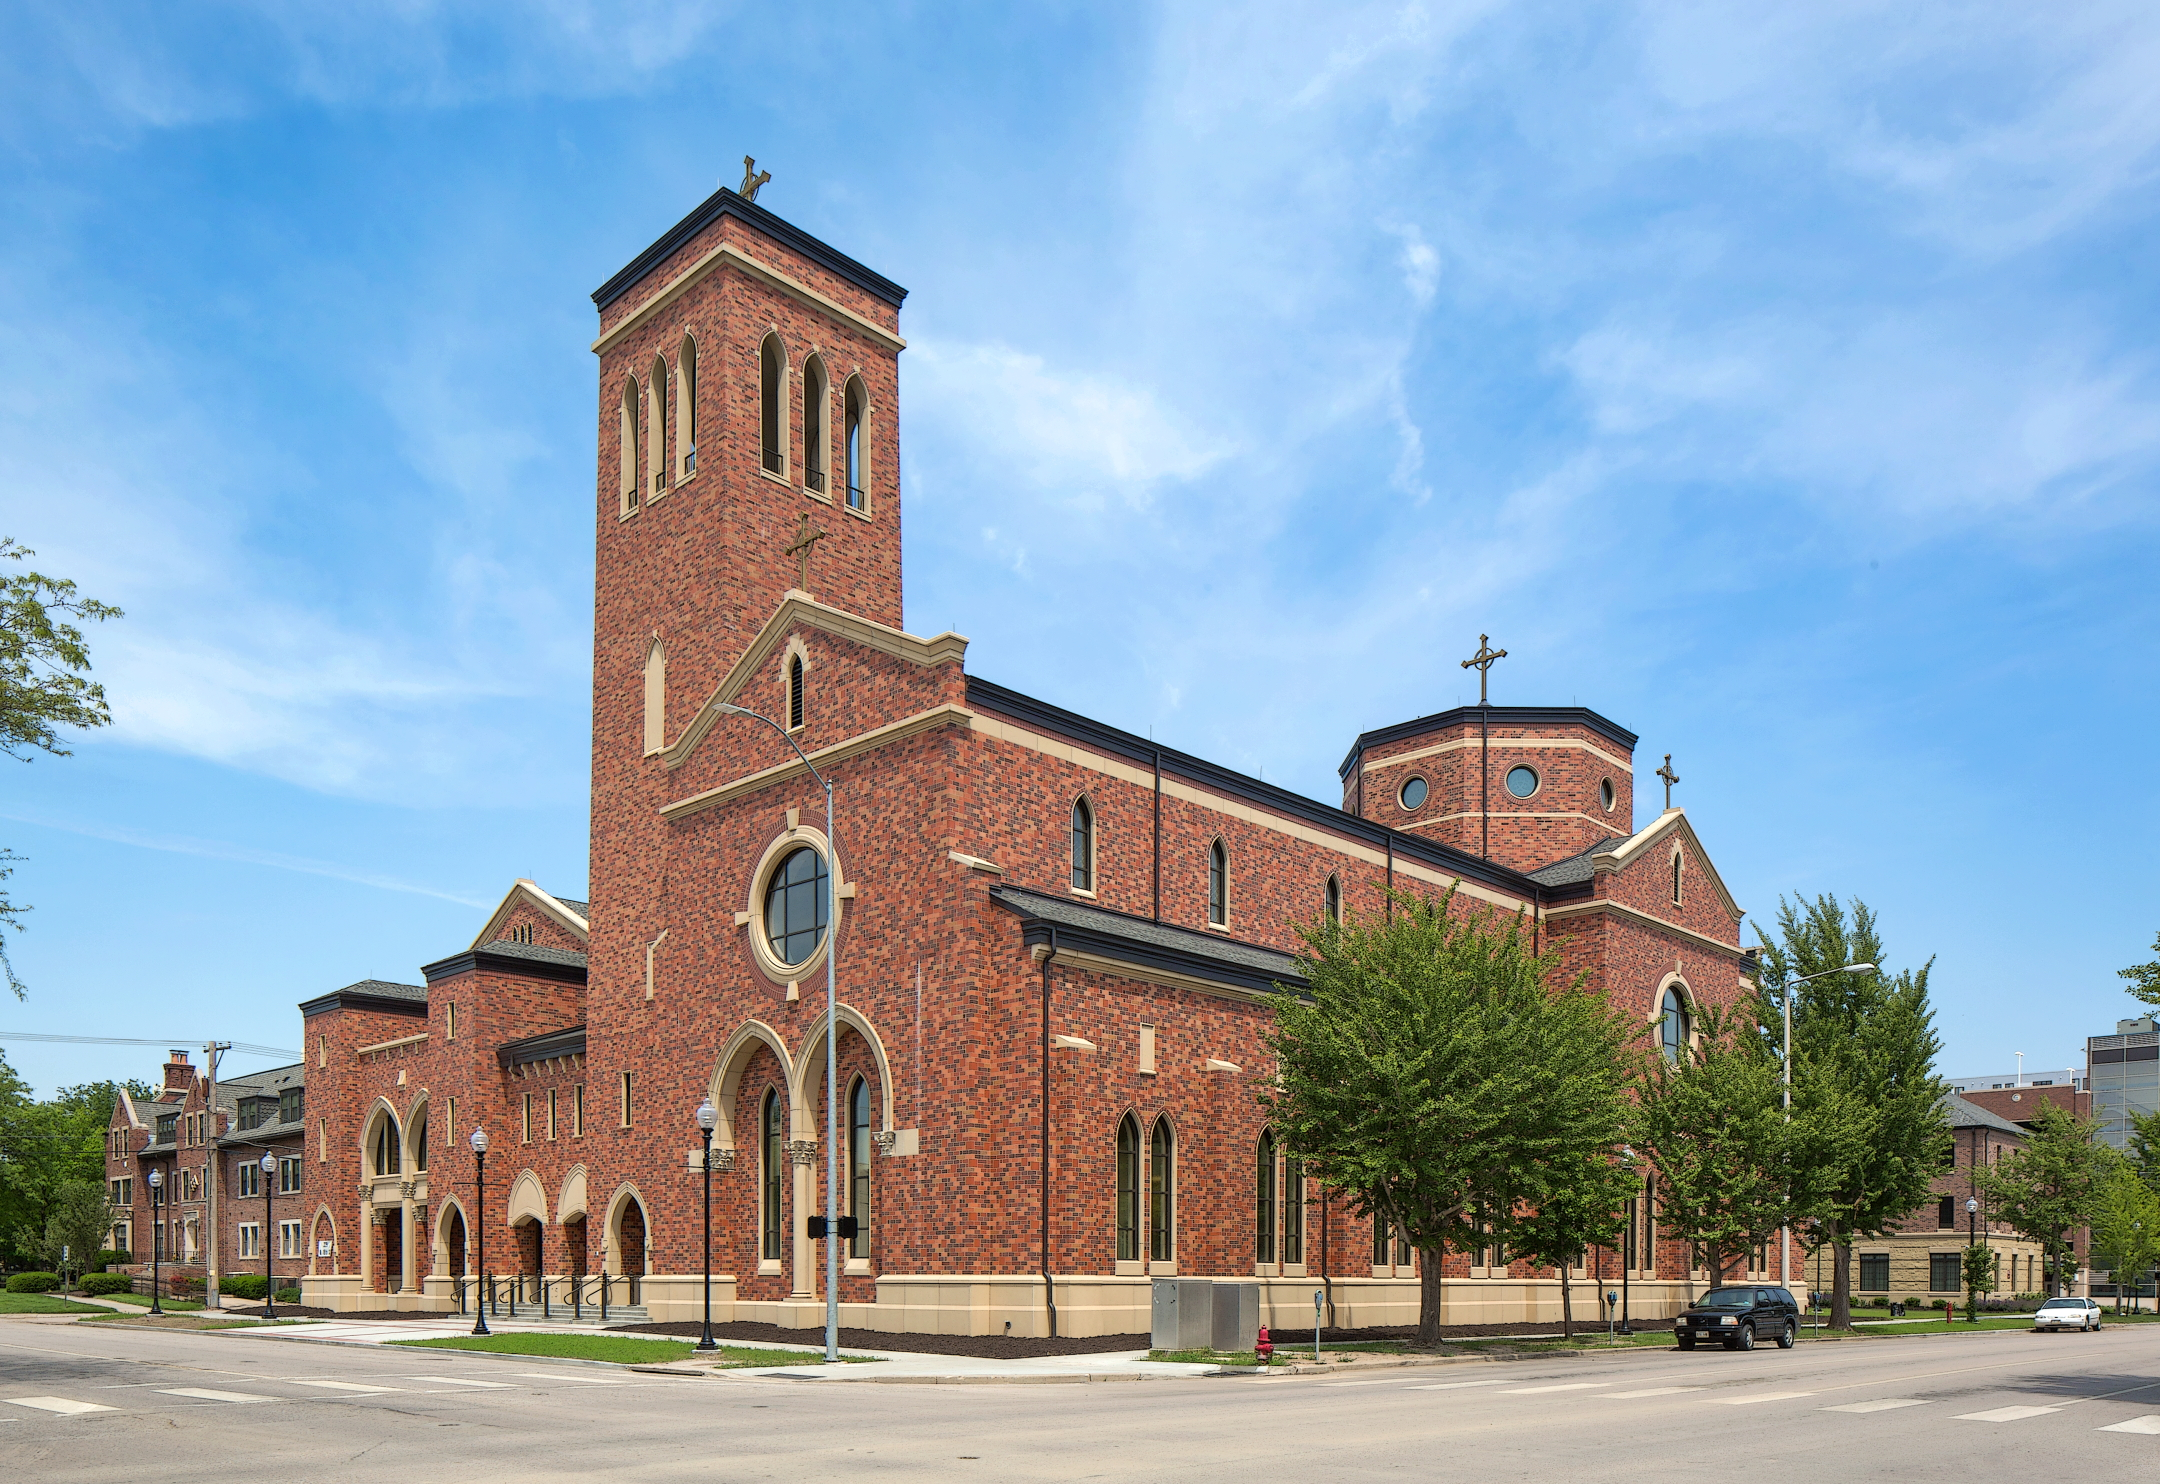 St Thomas Aquinas Church Communicates Beauty And